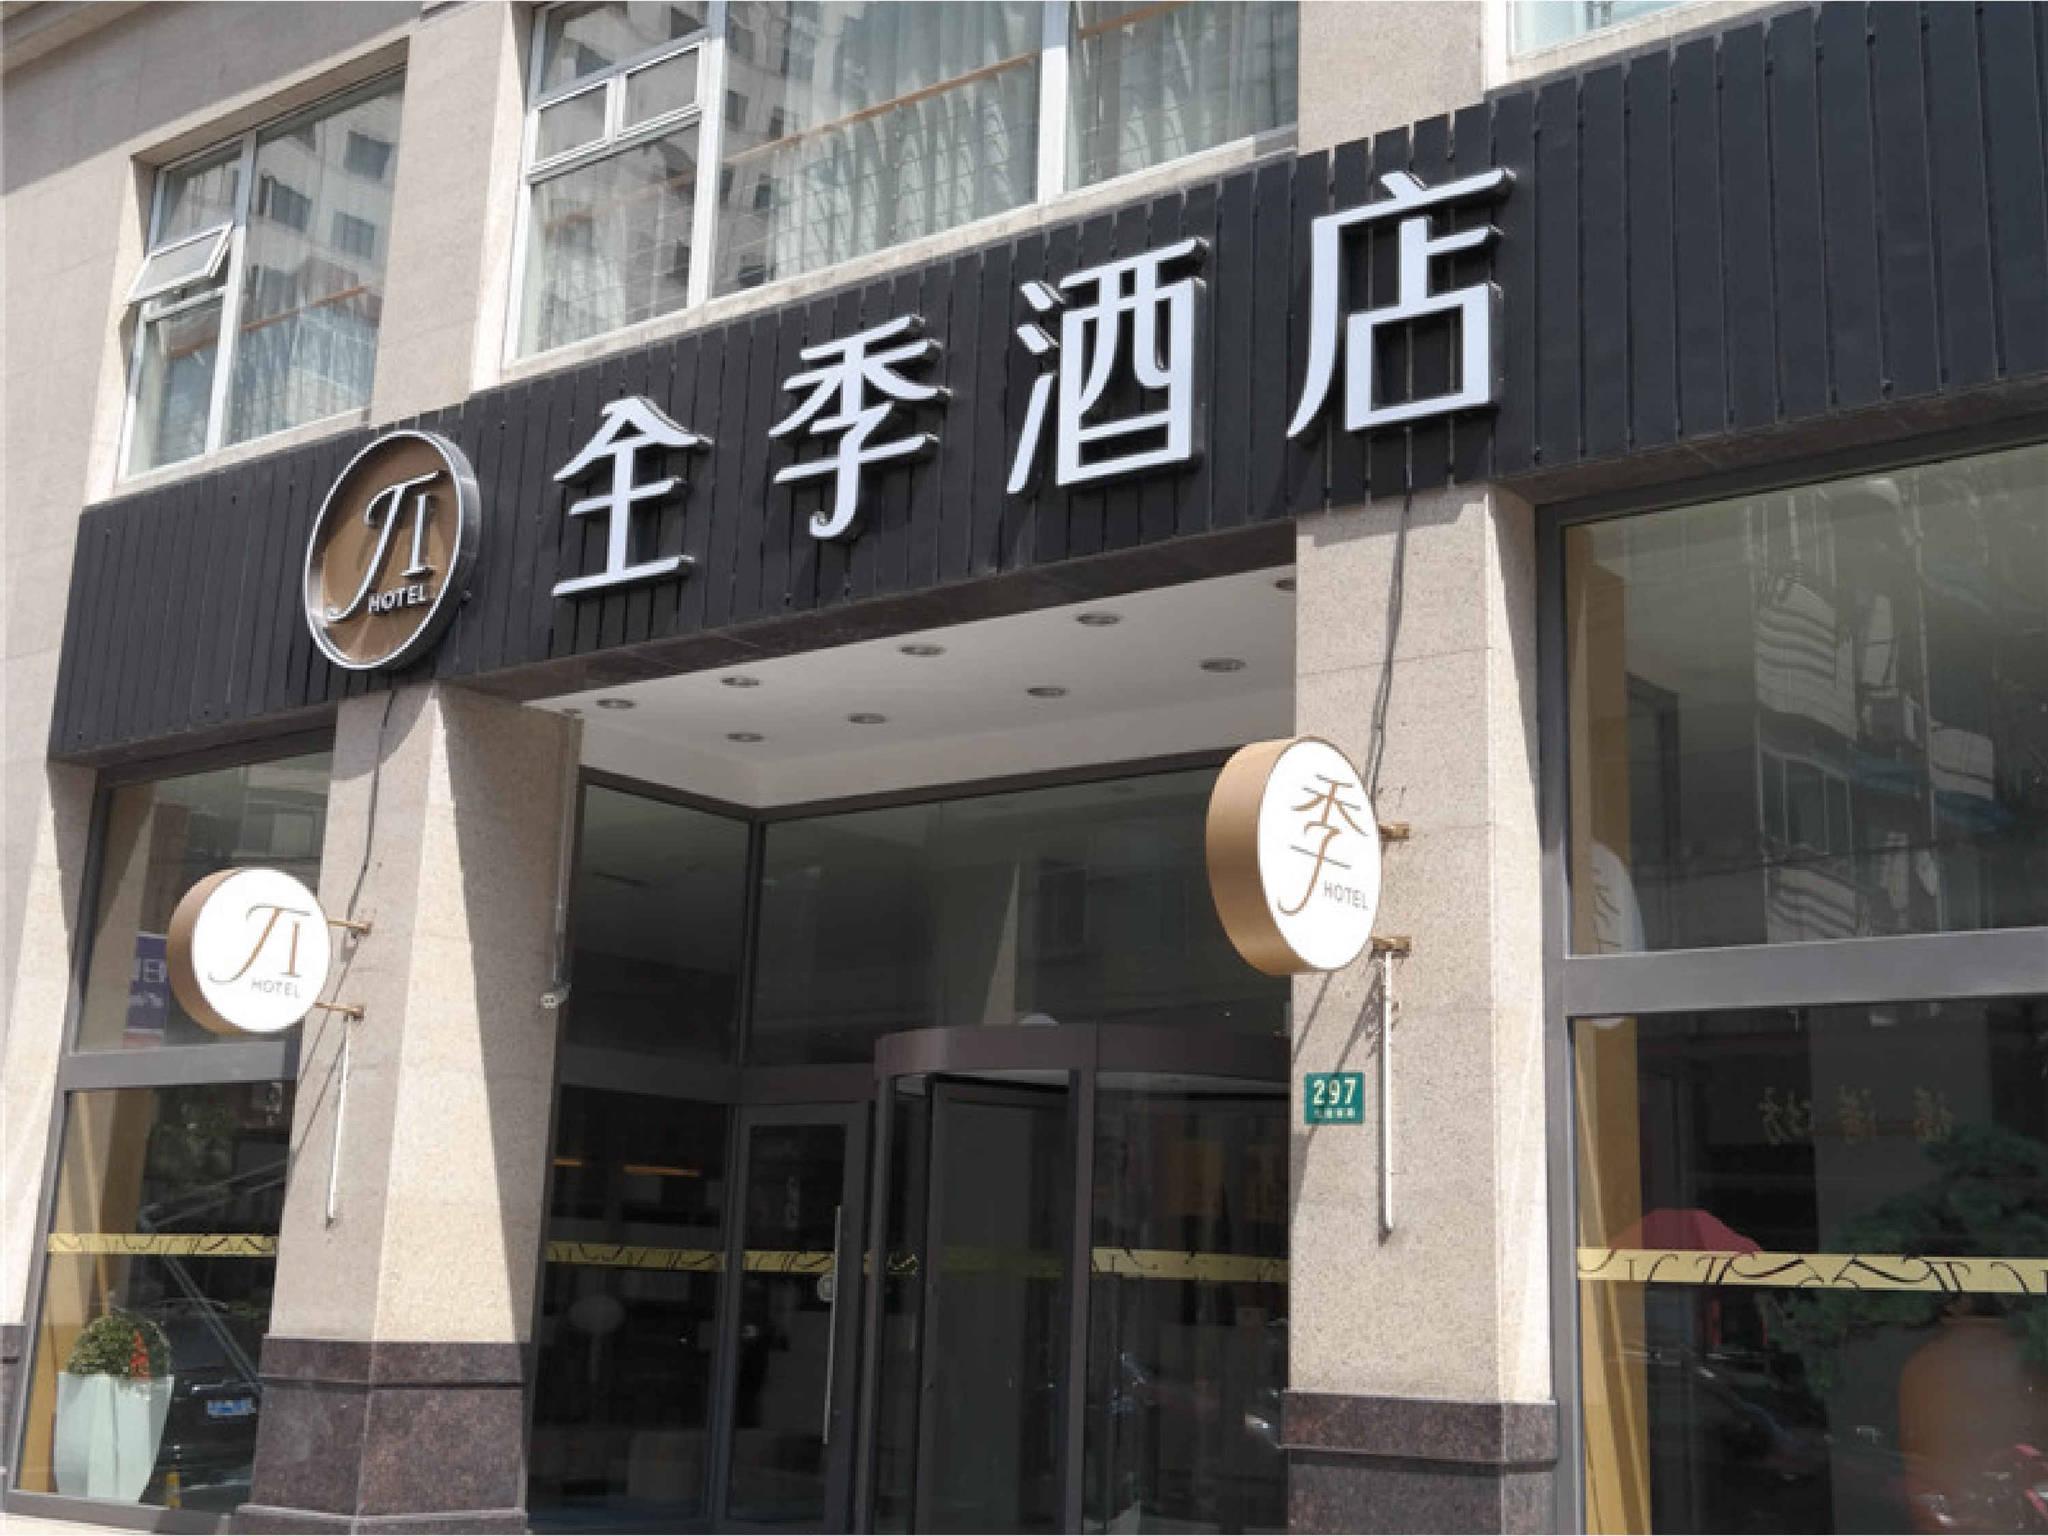 ホテル – JI ホテル 上海 淮海路